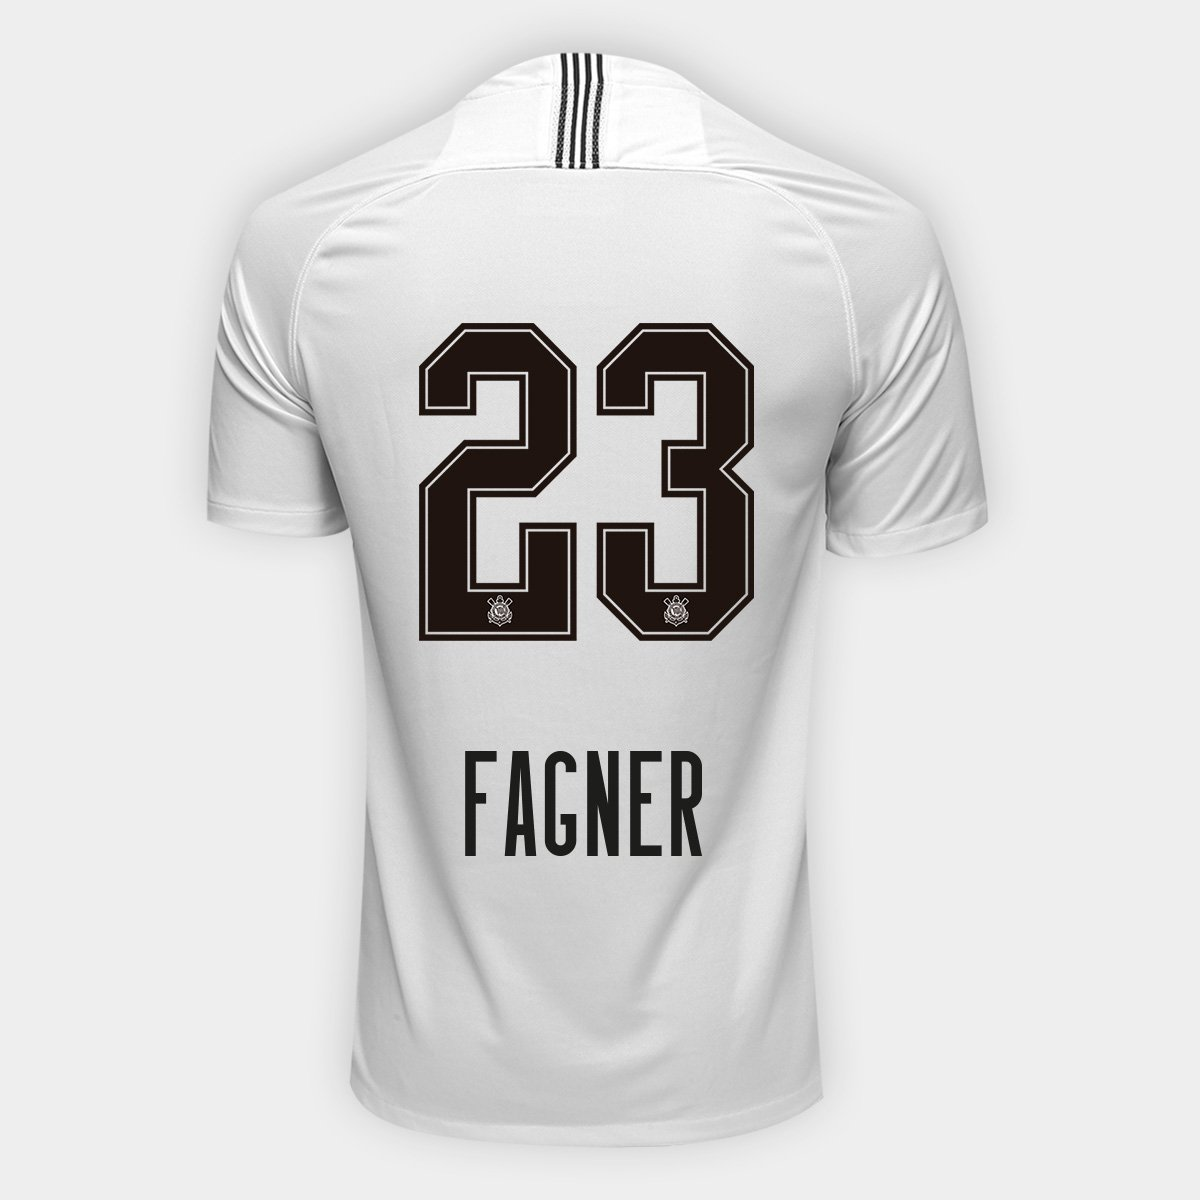 Camisa Corinthians I 18 19 Nº 23 Fagner - Torcedor Nike Masculina ... 2b660cae39bd5